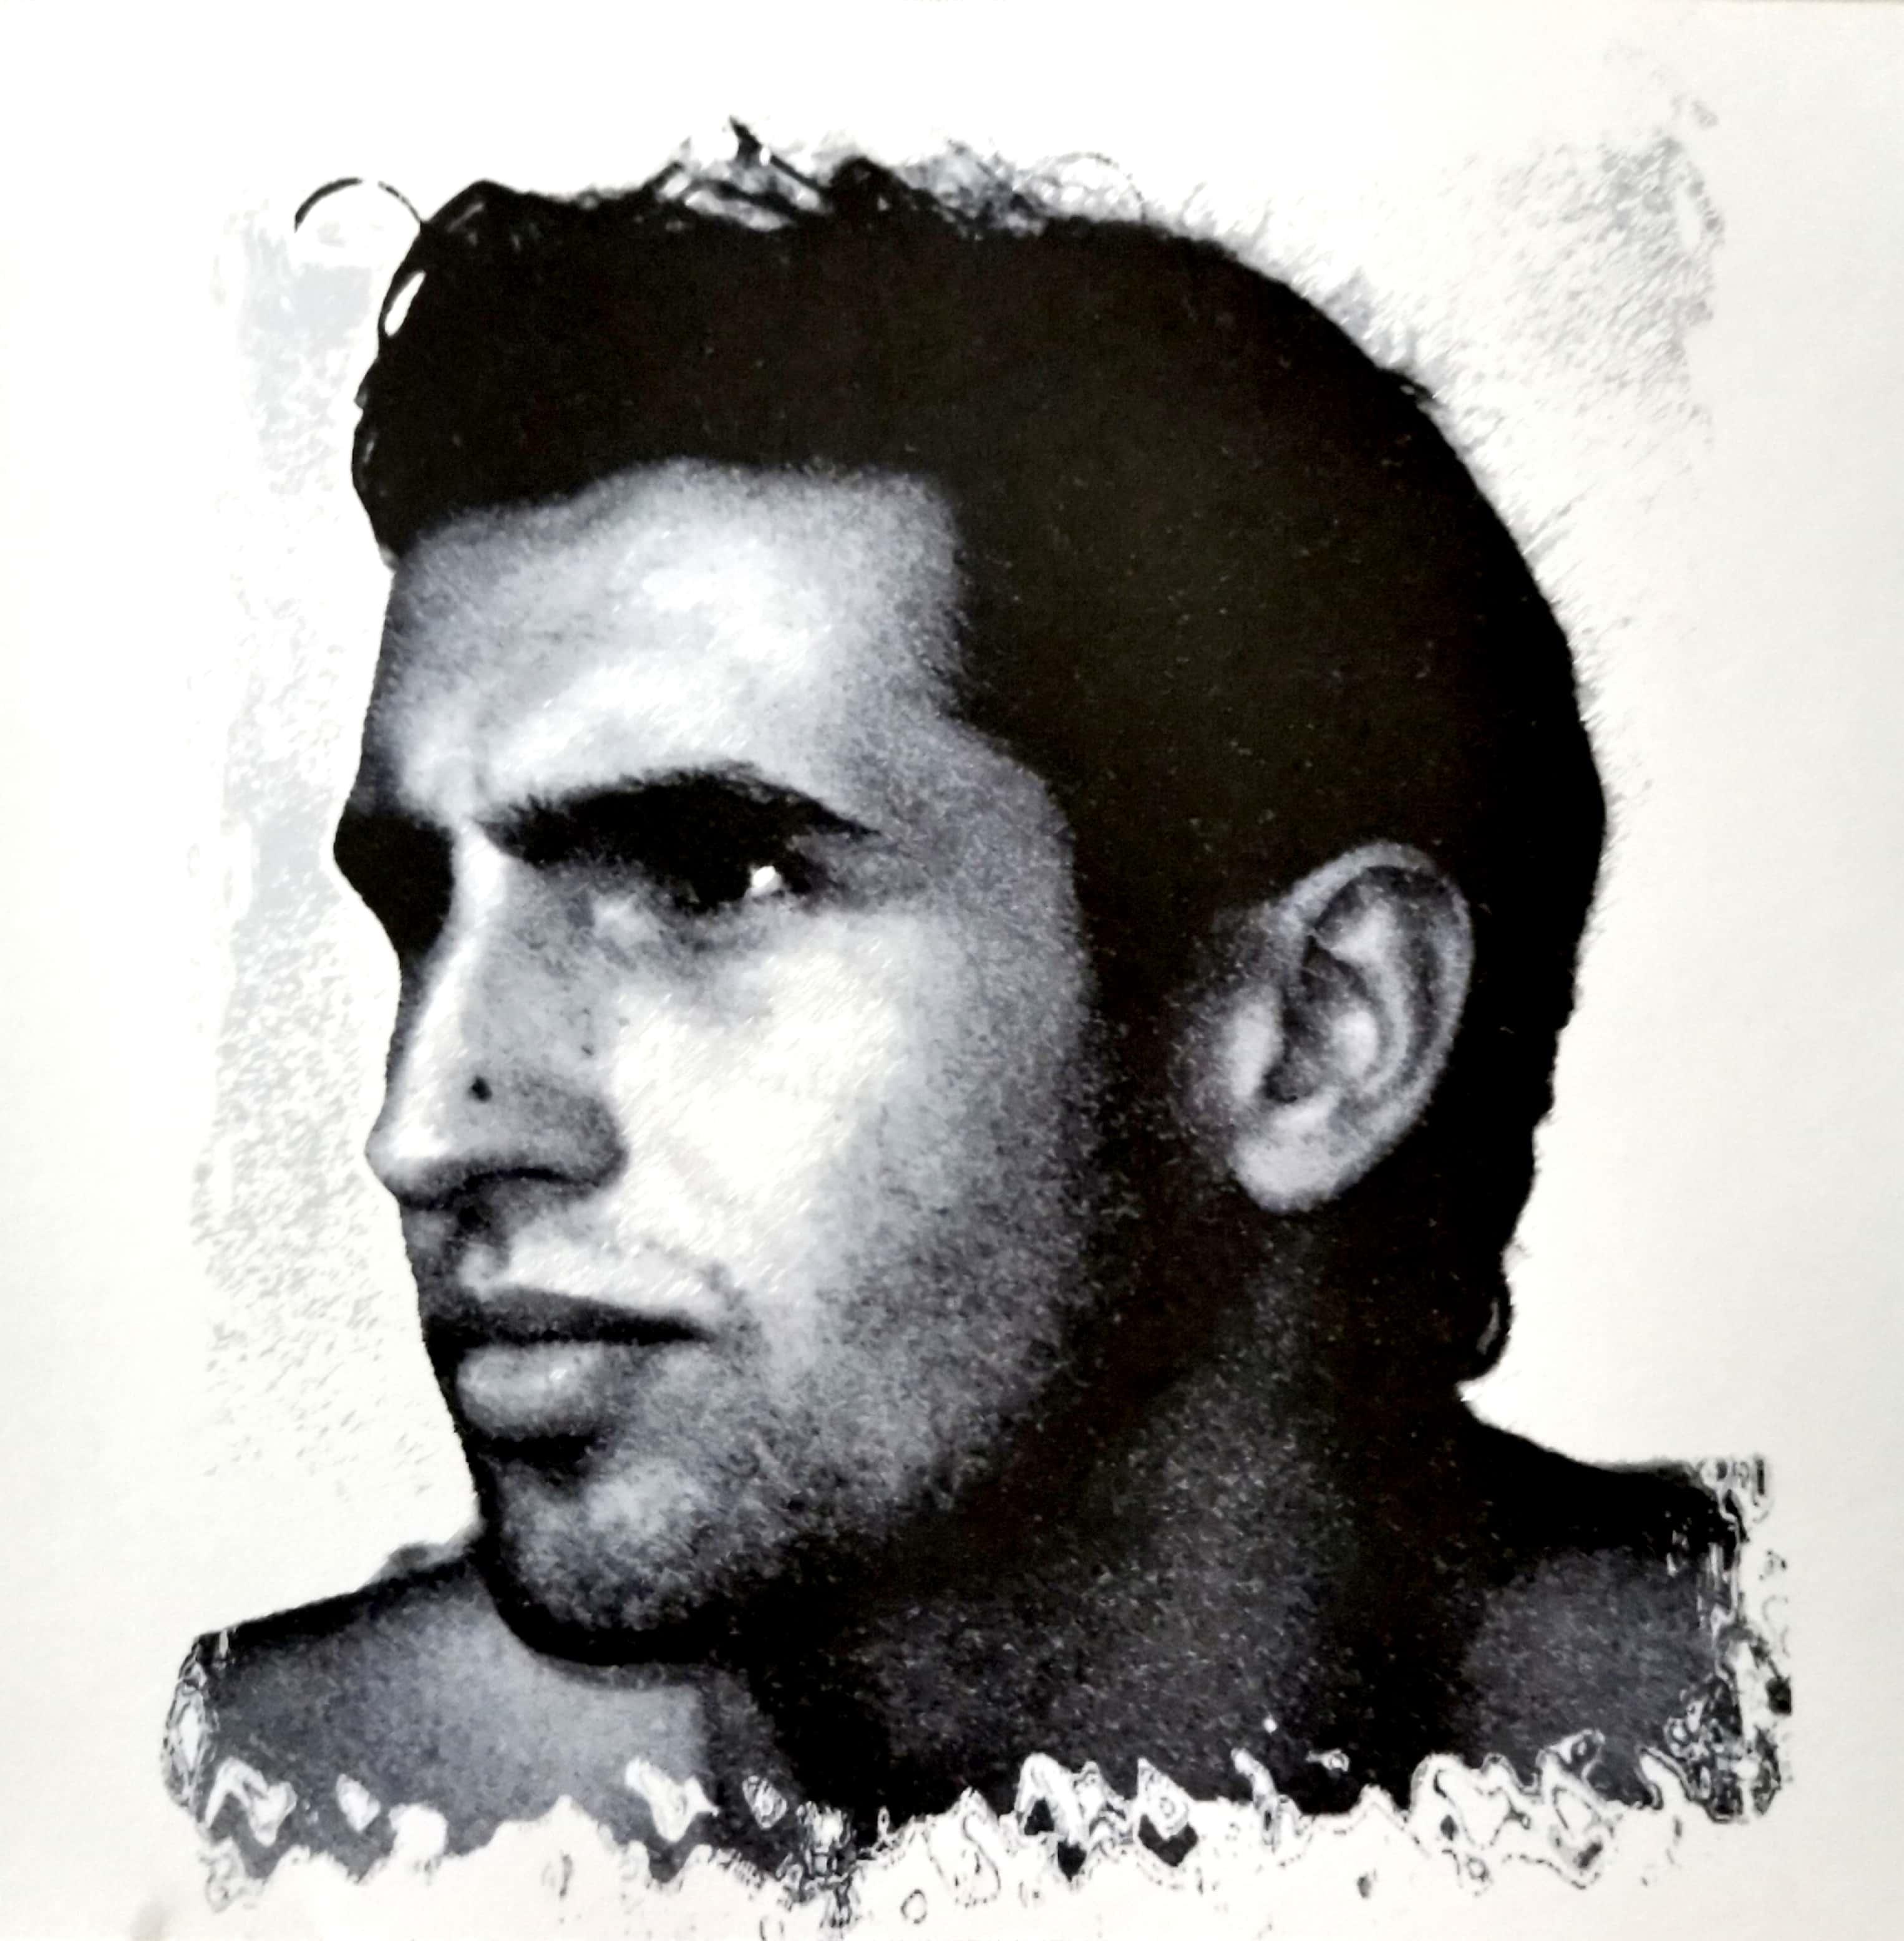 Matteo Lasagni